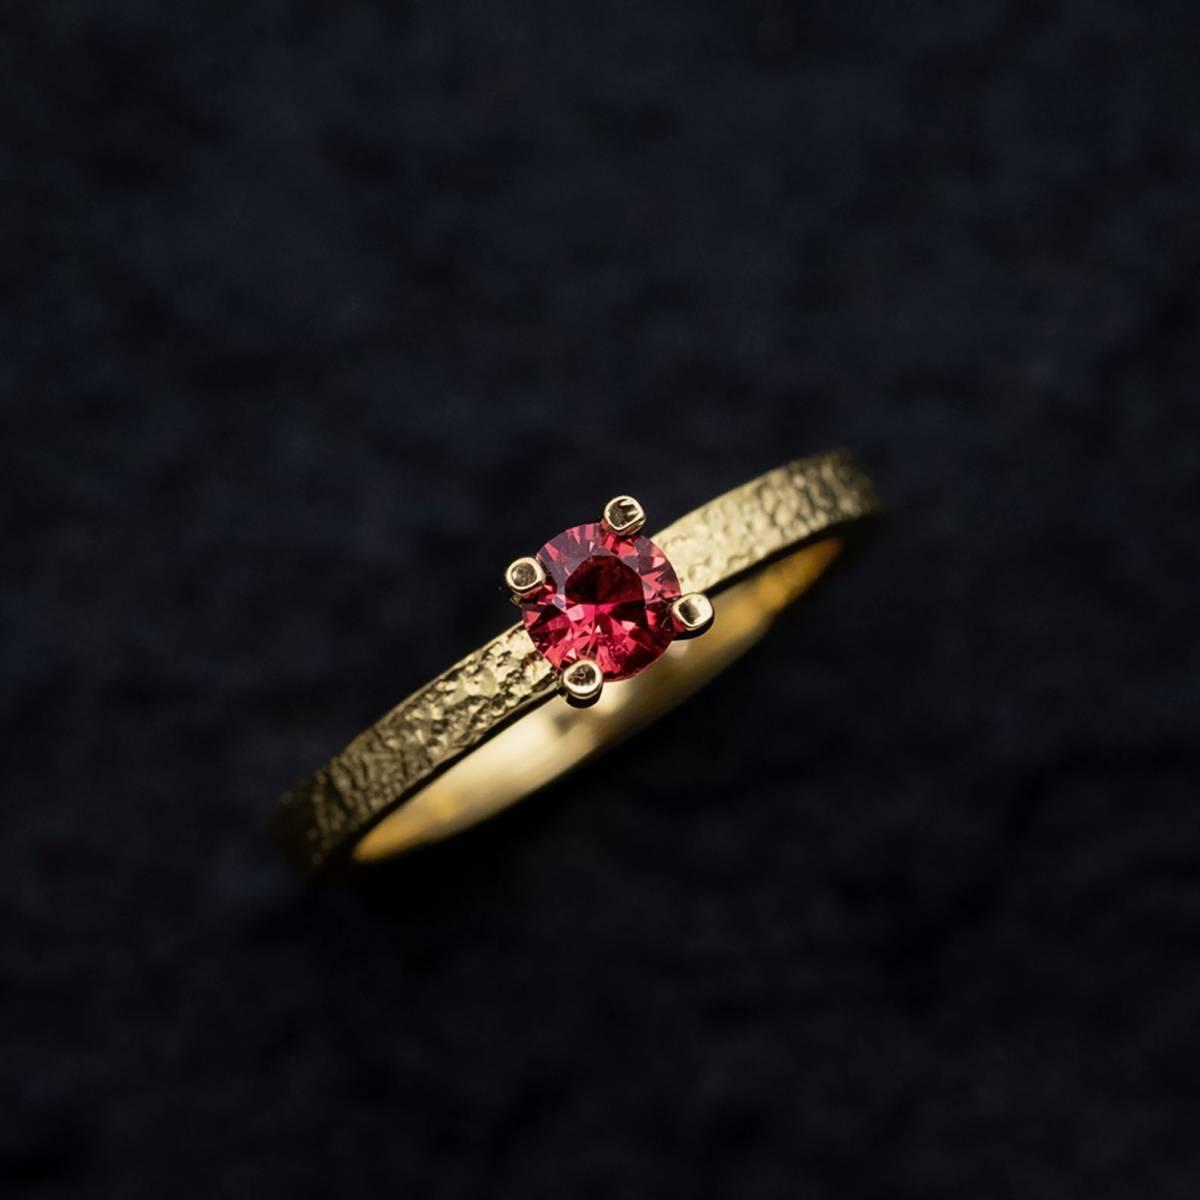 Jonas Maes Jewels - Juwelen - Bruidsjuwelen - Verlovingsring - Trouwring - House of Weddings - 27